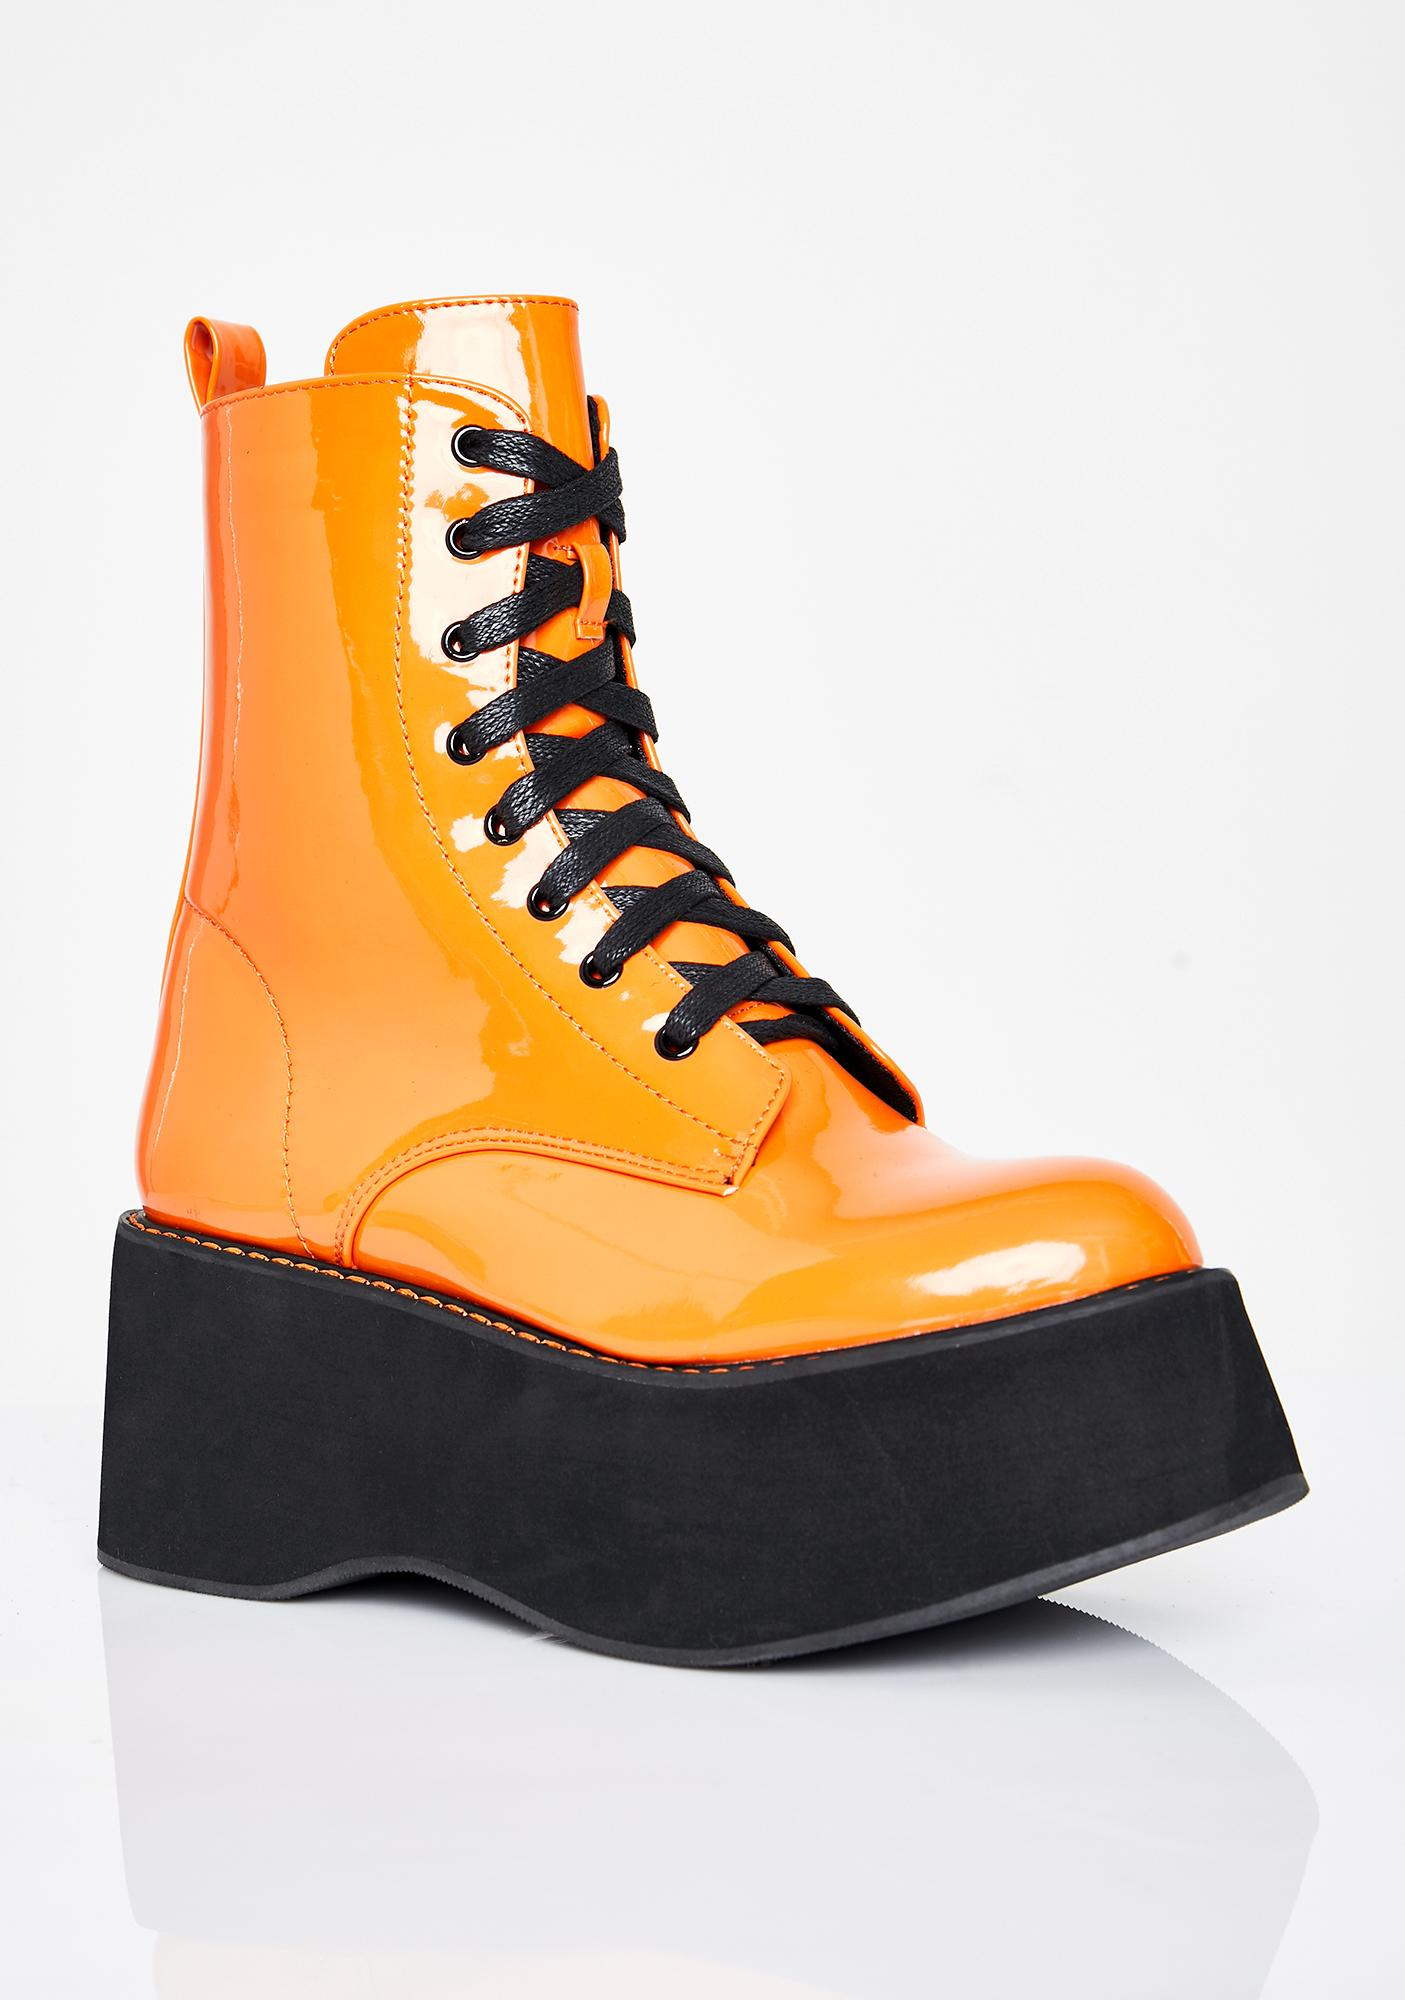 Koi Footwear Juicy Arkon Ankle Boots